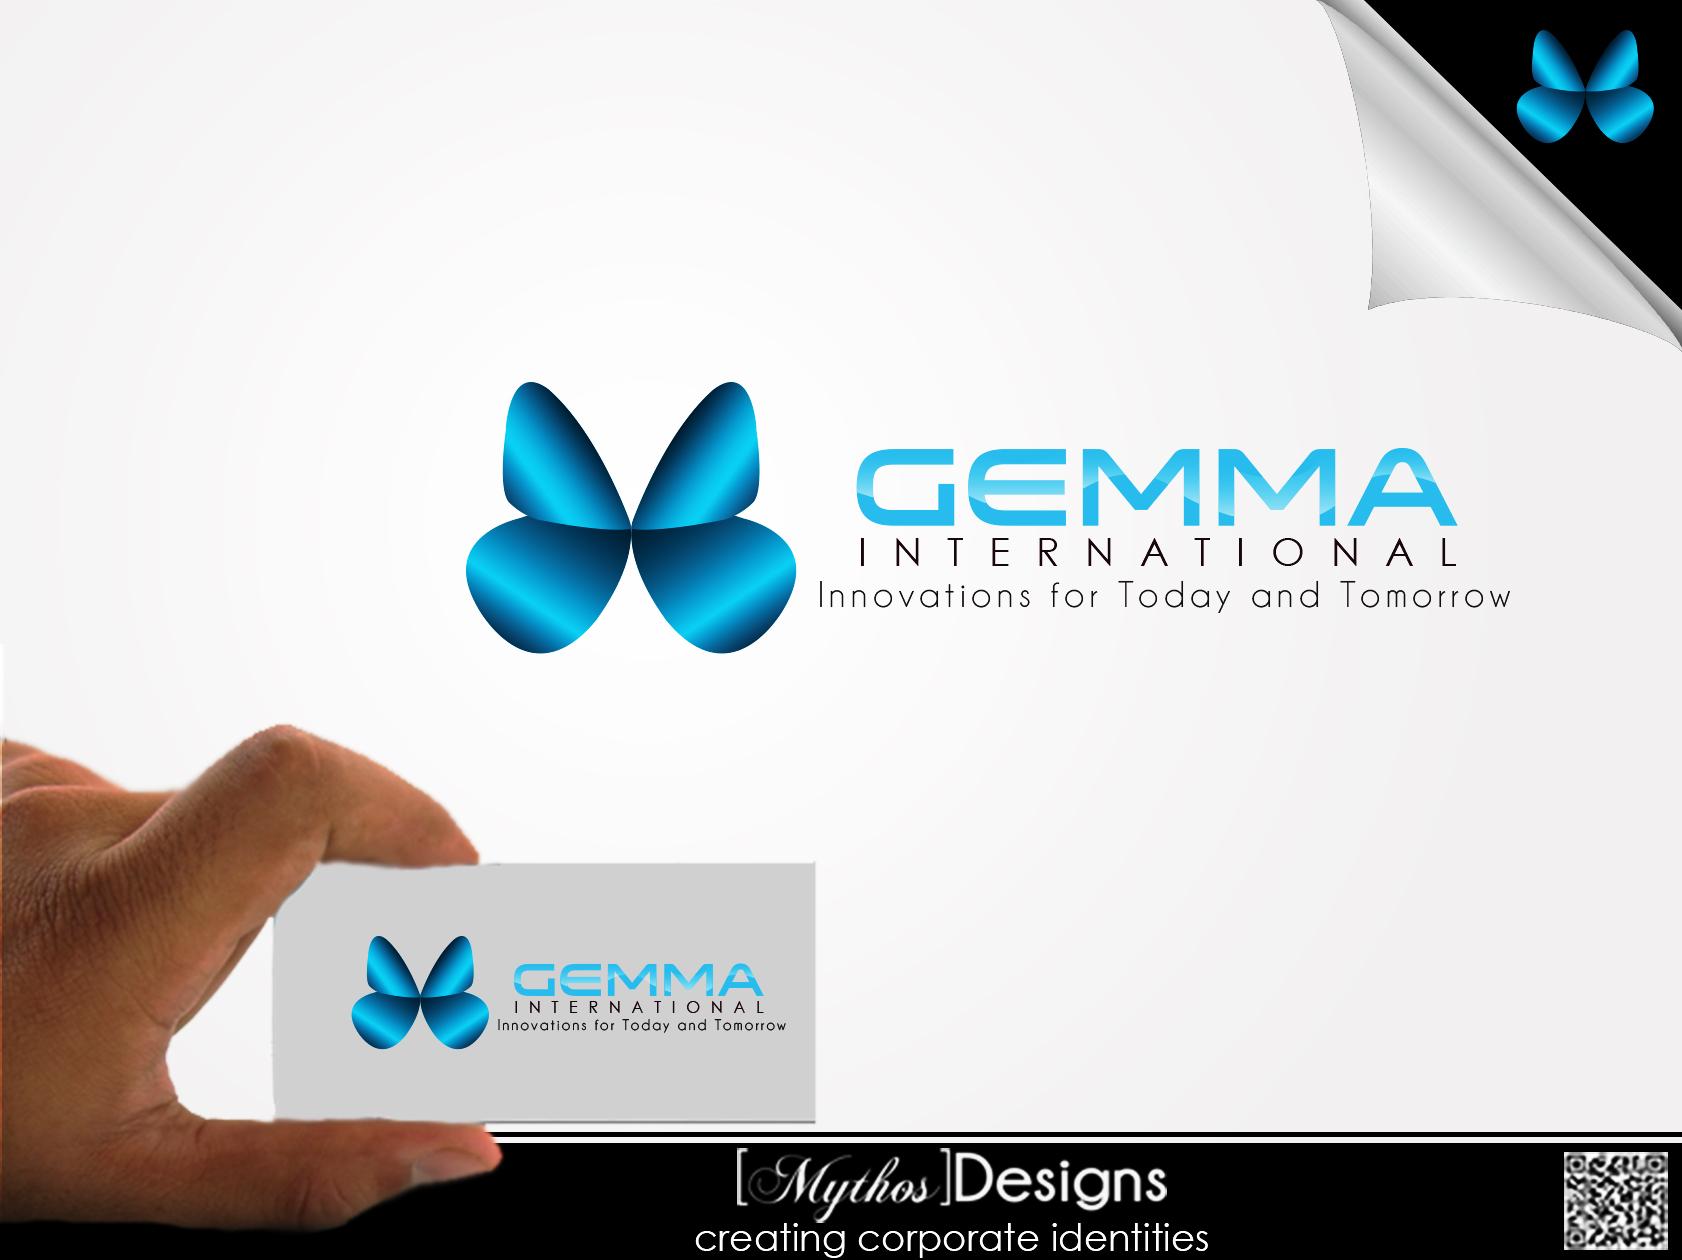 Logo Design by Mythos Designs - Entry No. 96 in the Logo Design Contest Artistic Logo Design for Gemma International.